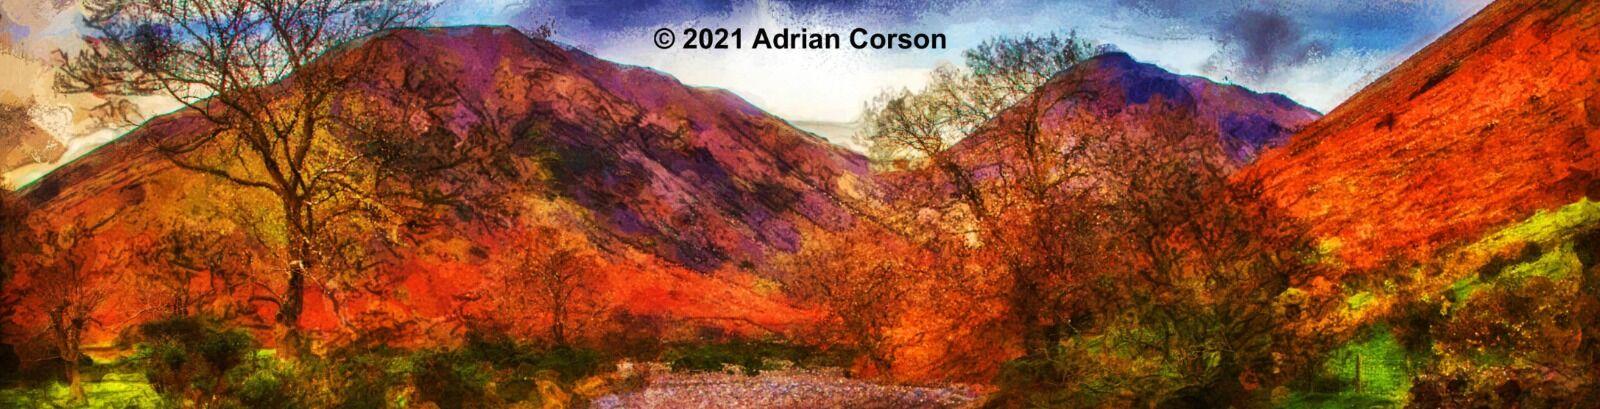 192-autumn mountain stream